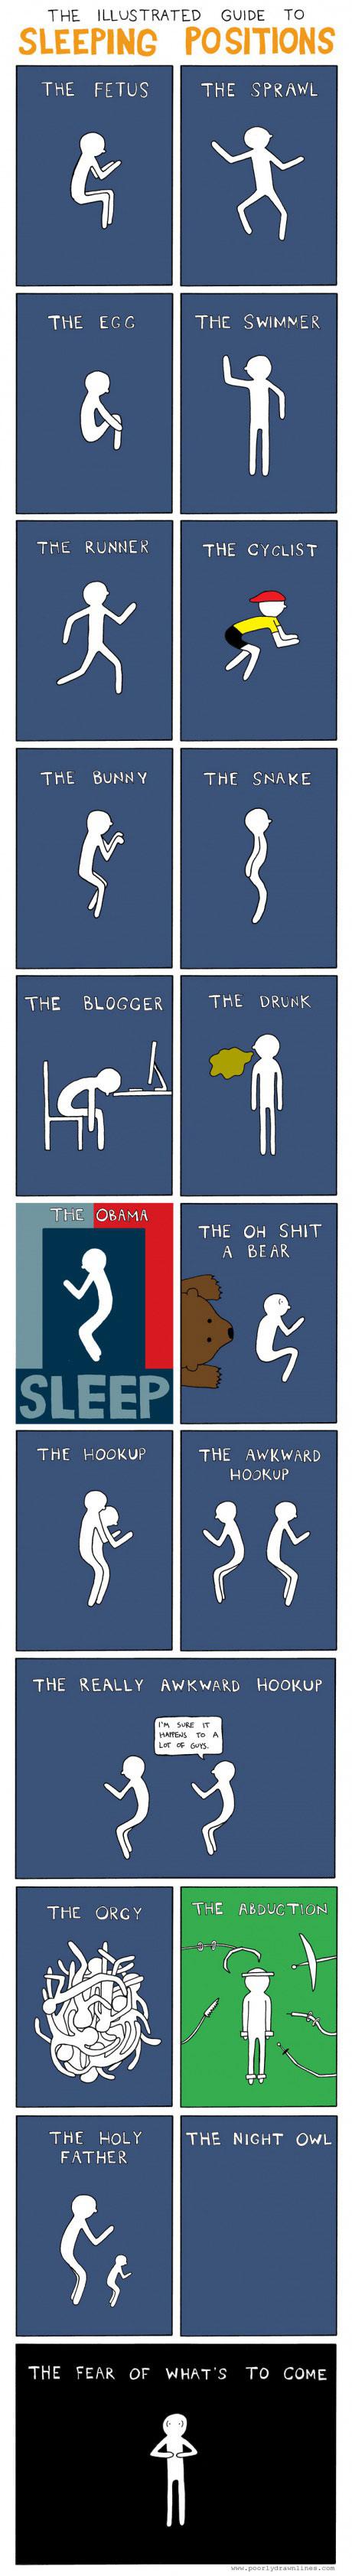 sleep, position, compilation, lol